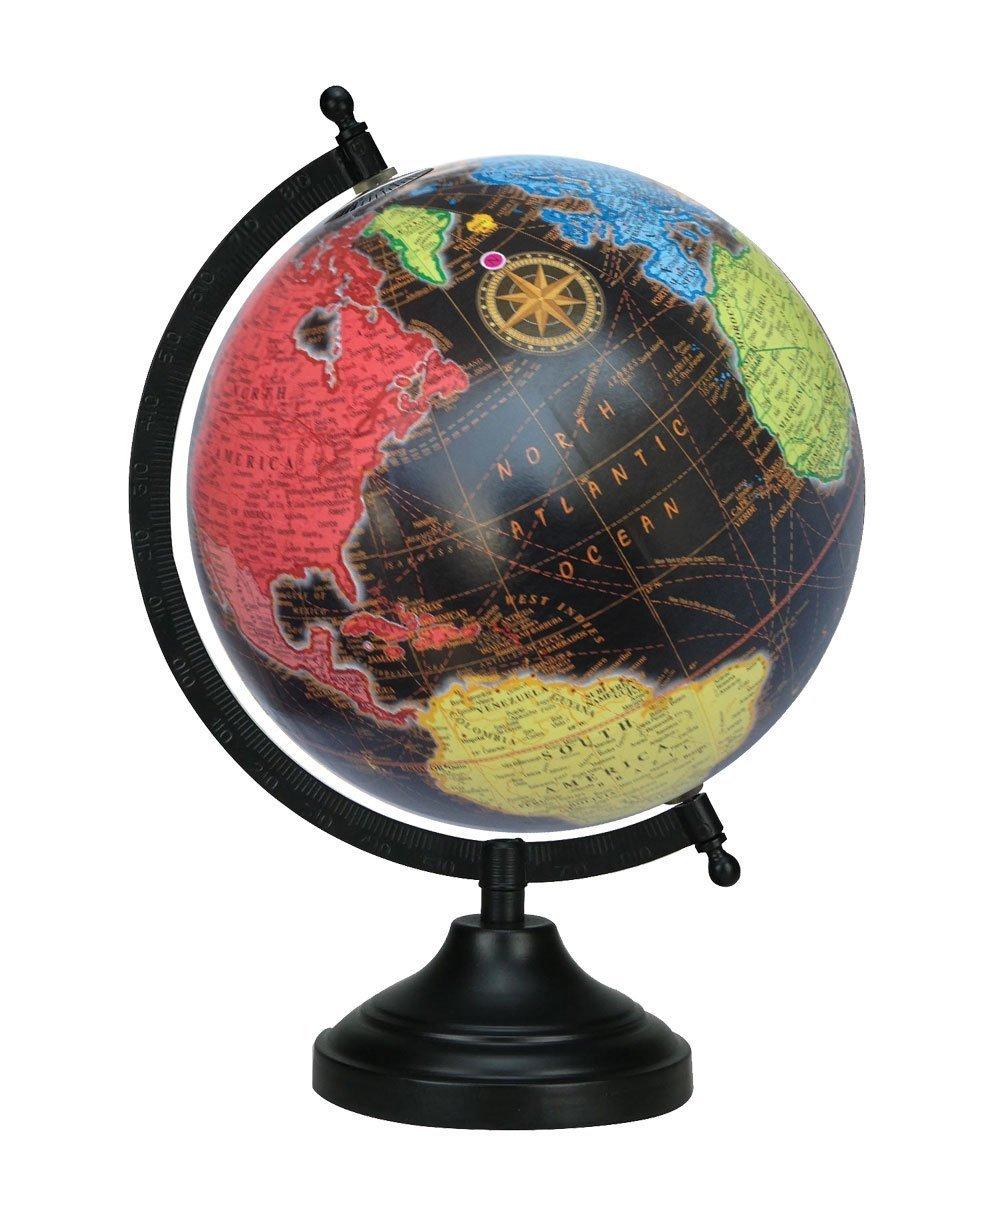 13 Decorative Desktop Rotating Globe Constellation Stars Globes Table Decor Uniworld